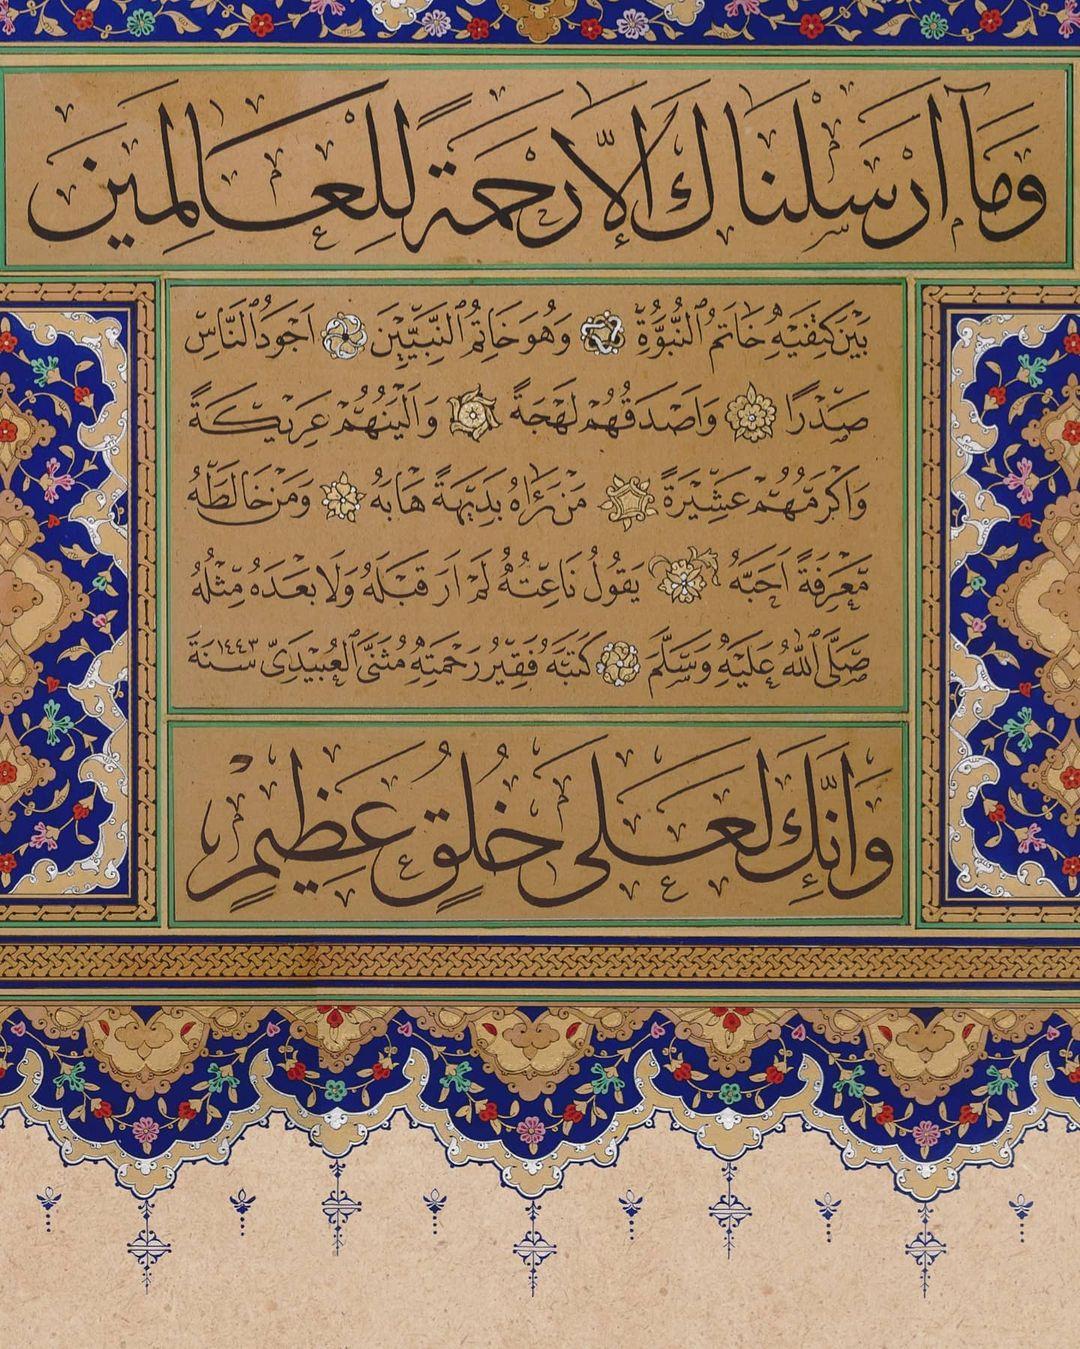 khat/hat/kat Tsulust/Thuluth Mothana Alobaydi حلية جديدة مذهبة design of zagrfa is for @sayin.ayse... 1131 2